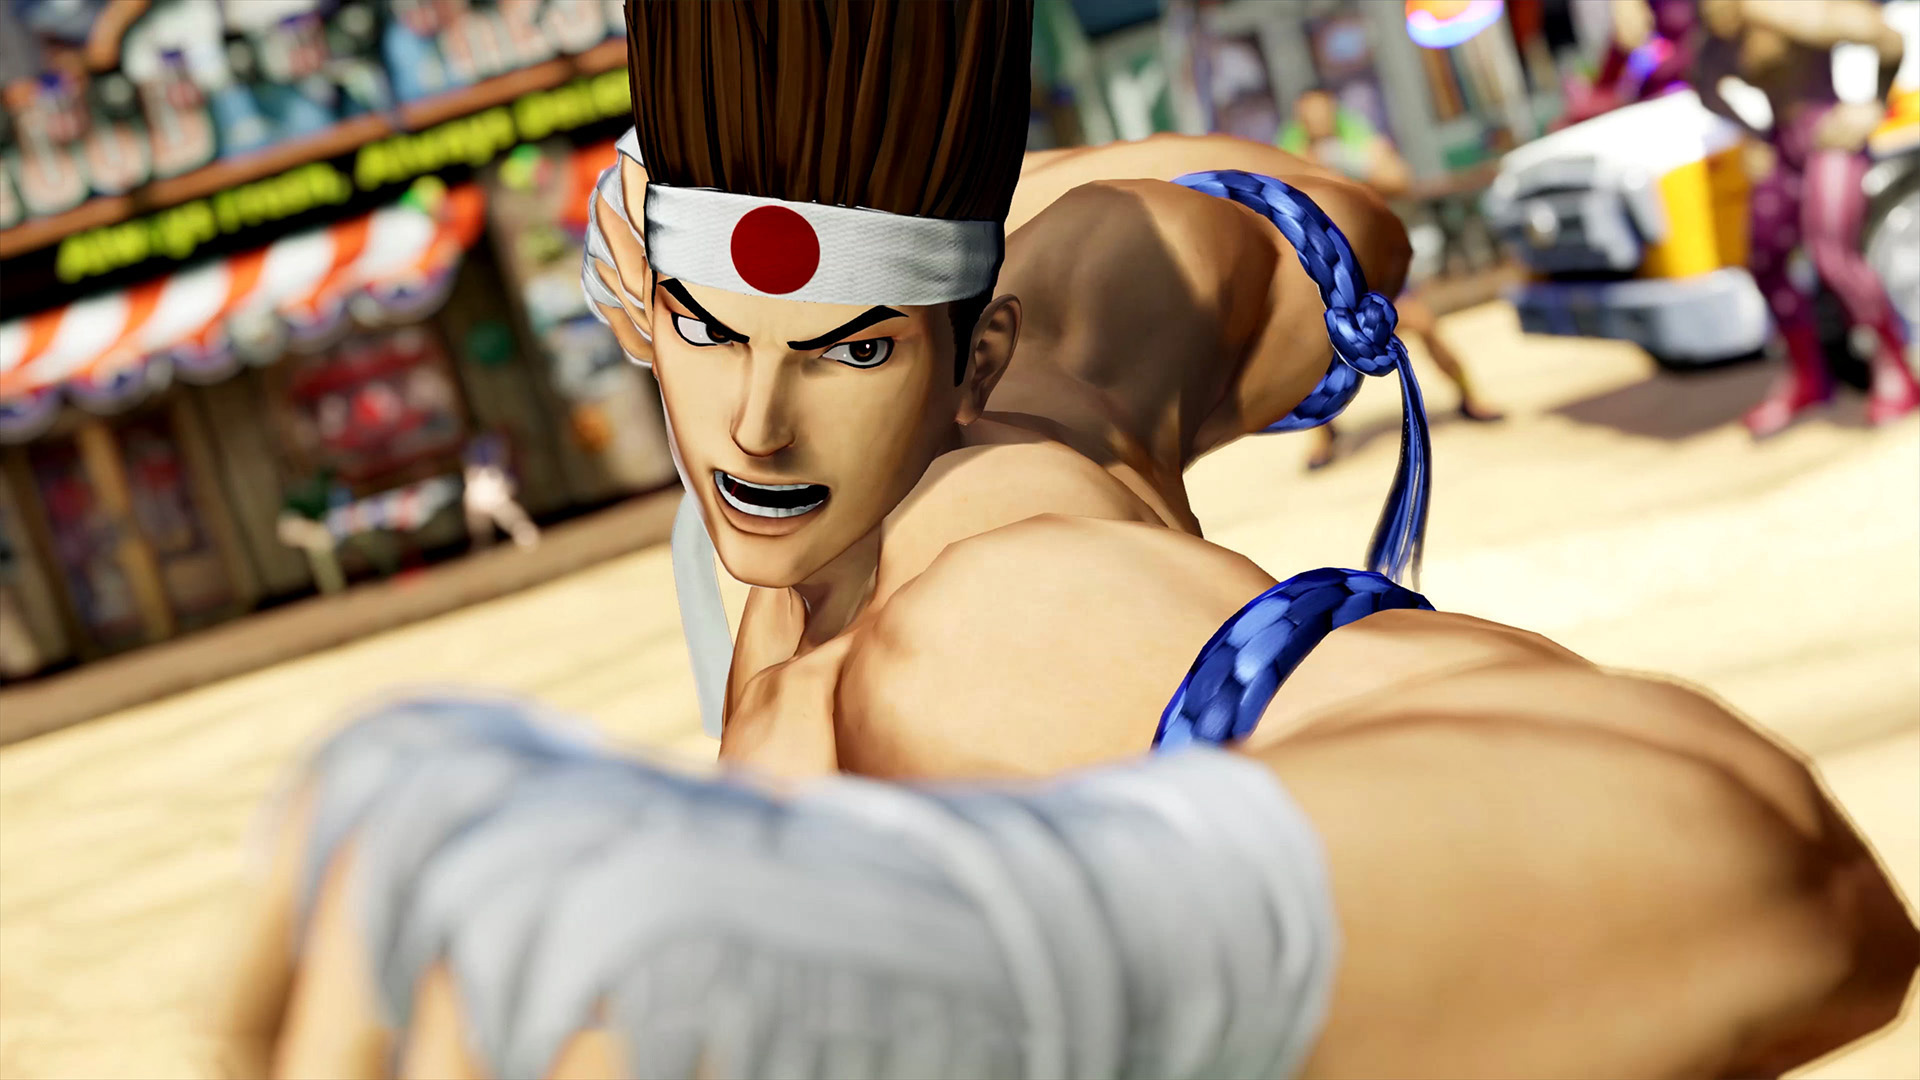 The King of Fighters XV: новый трейлер и скриншоты посвятили Джо Хигаси